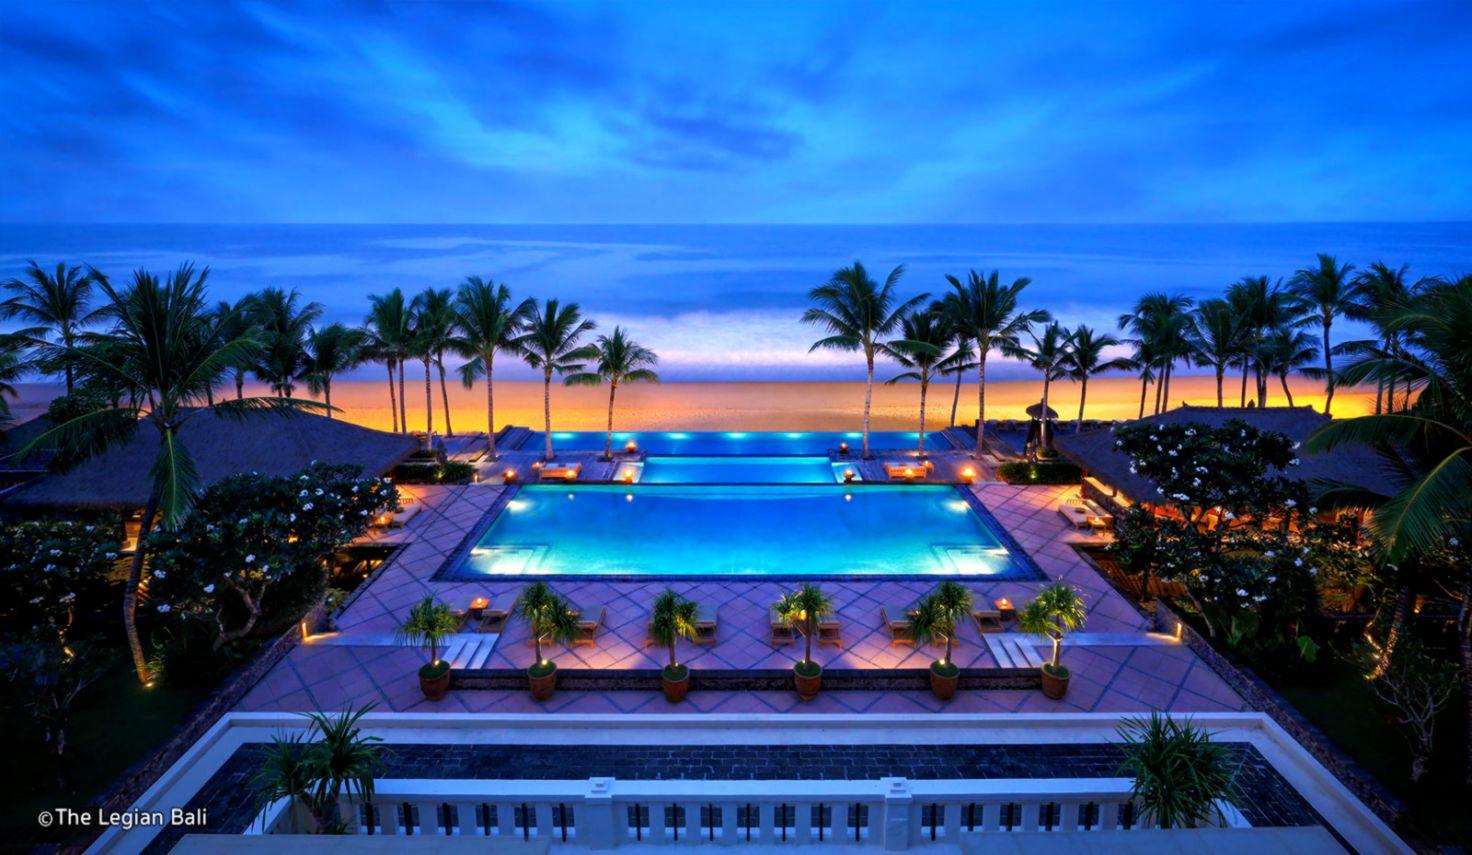 10 Best Luxury Hotels in Seminyak Most Popular Seminyak 5 Star